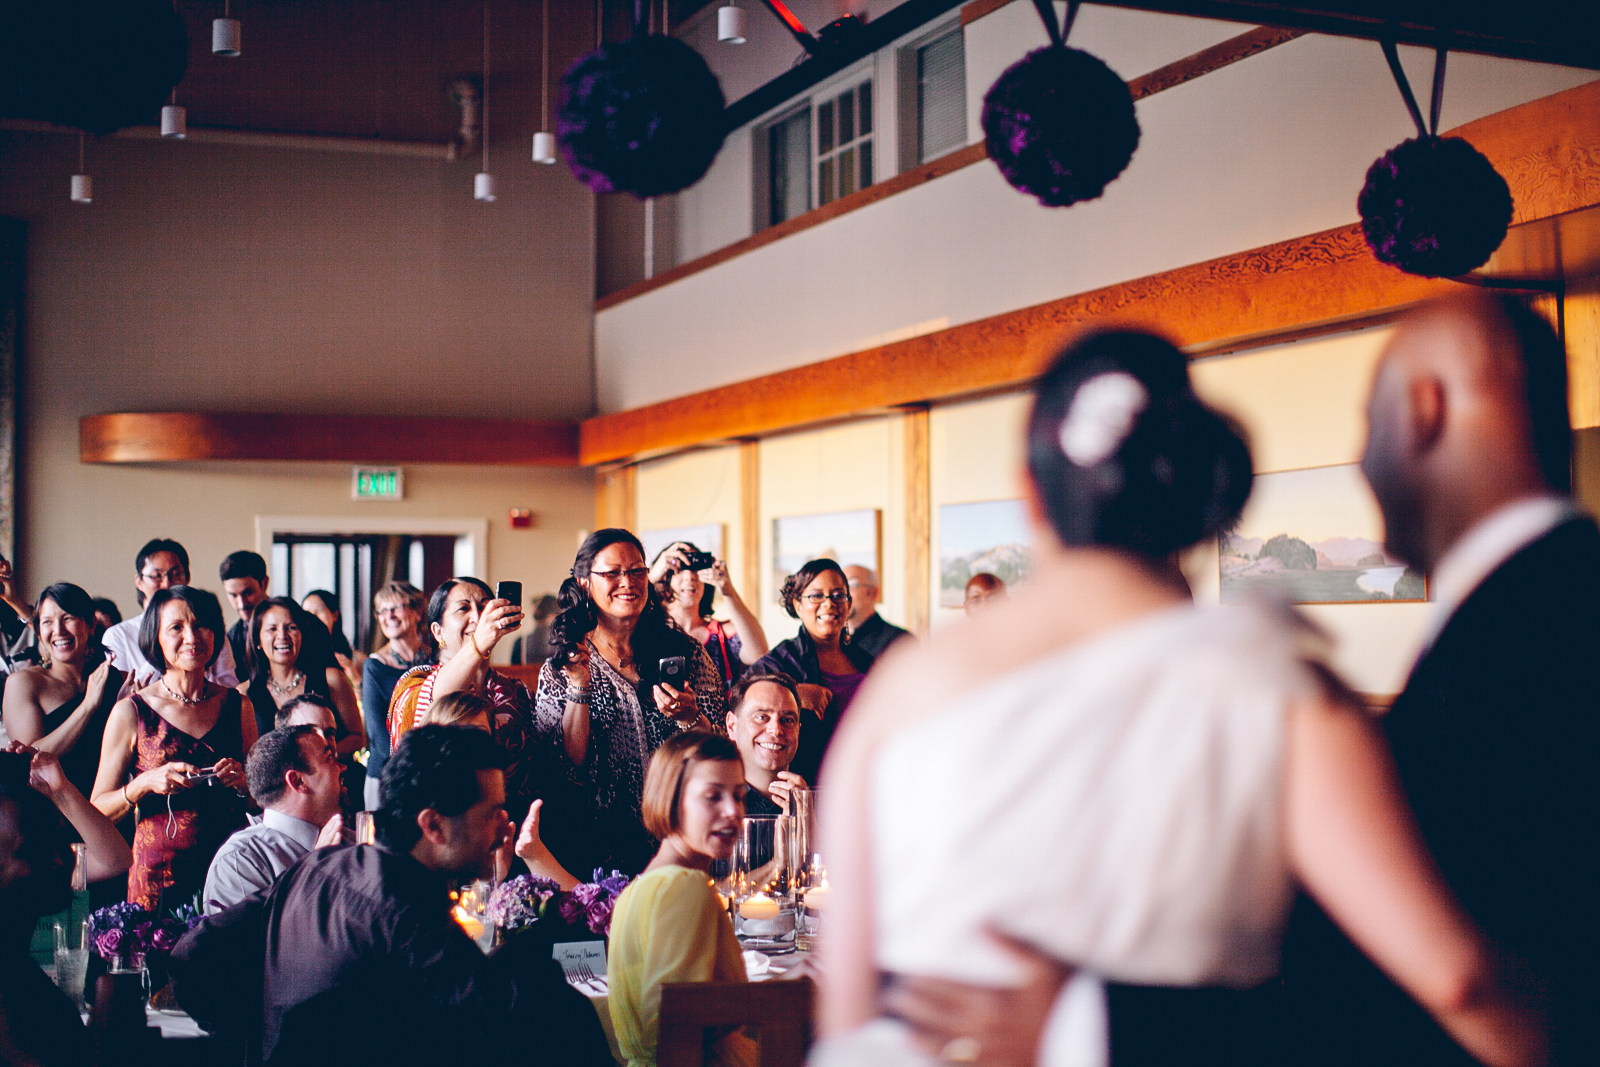 greens_restaurant_wedding_photography_san_franscisco_ebony_siovhan_bokeh_photography_68.jpg